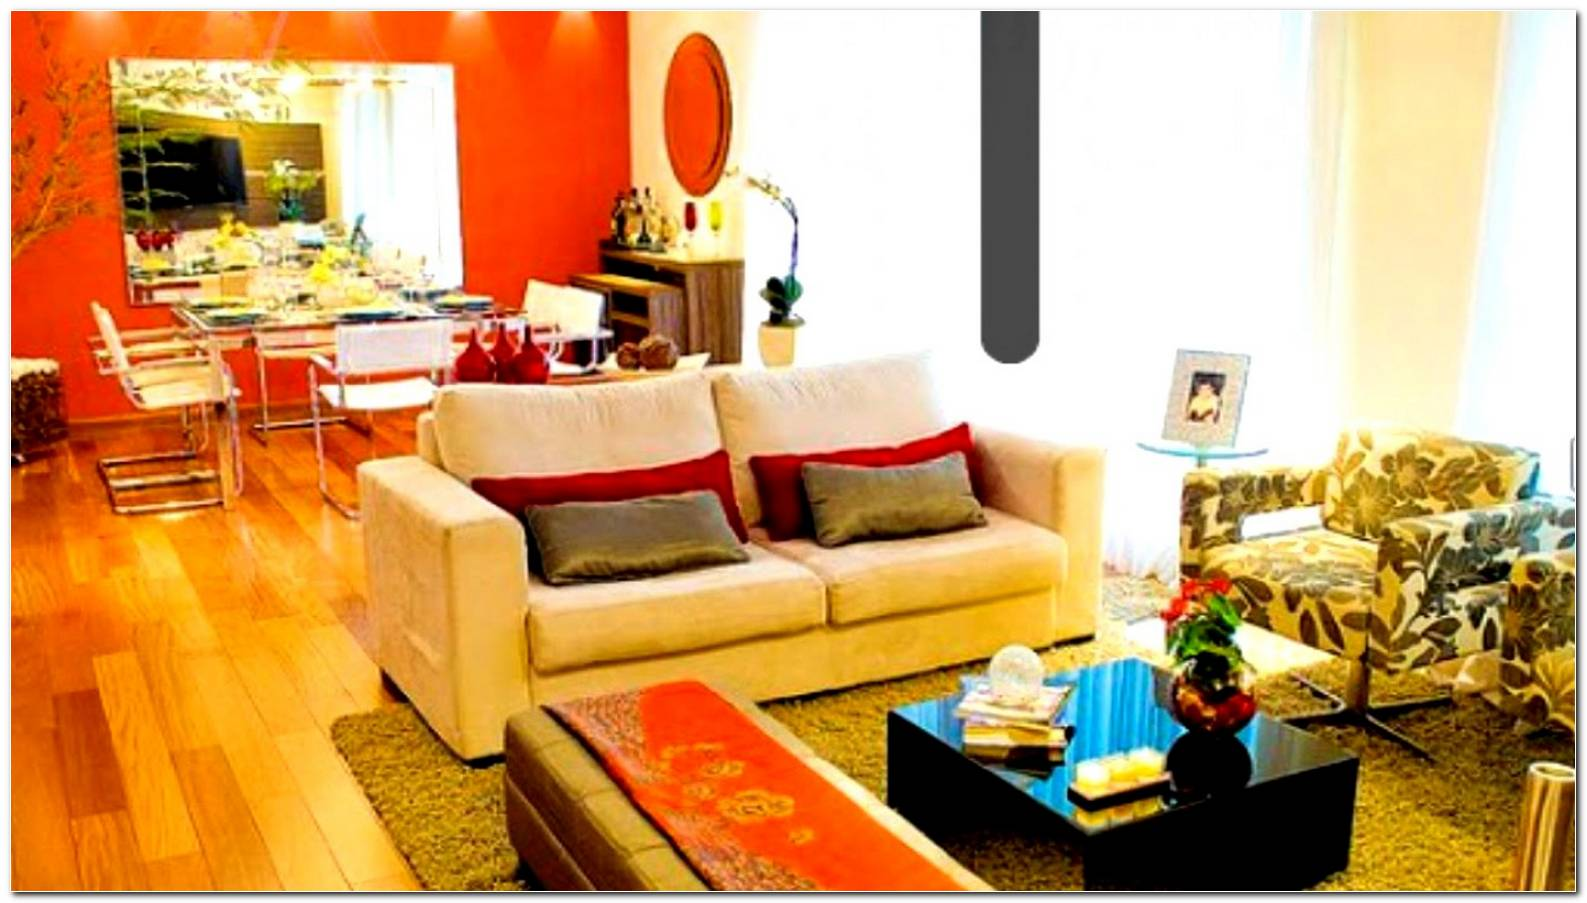 Decoracion Sala Comedor Naranja